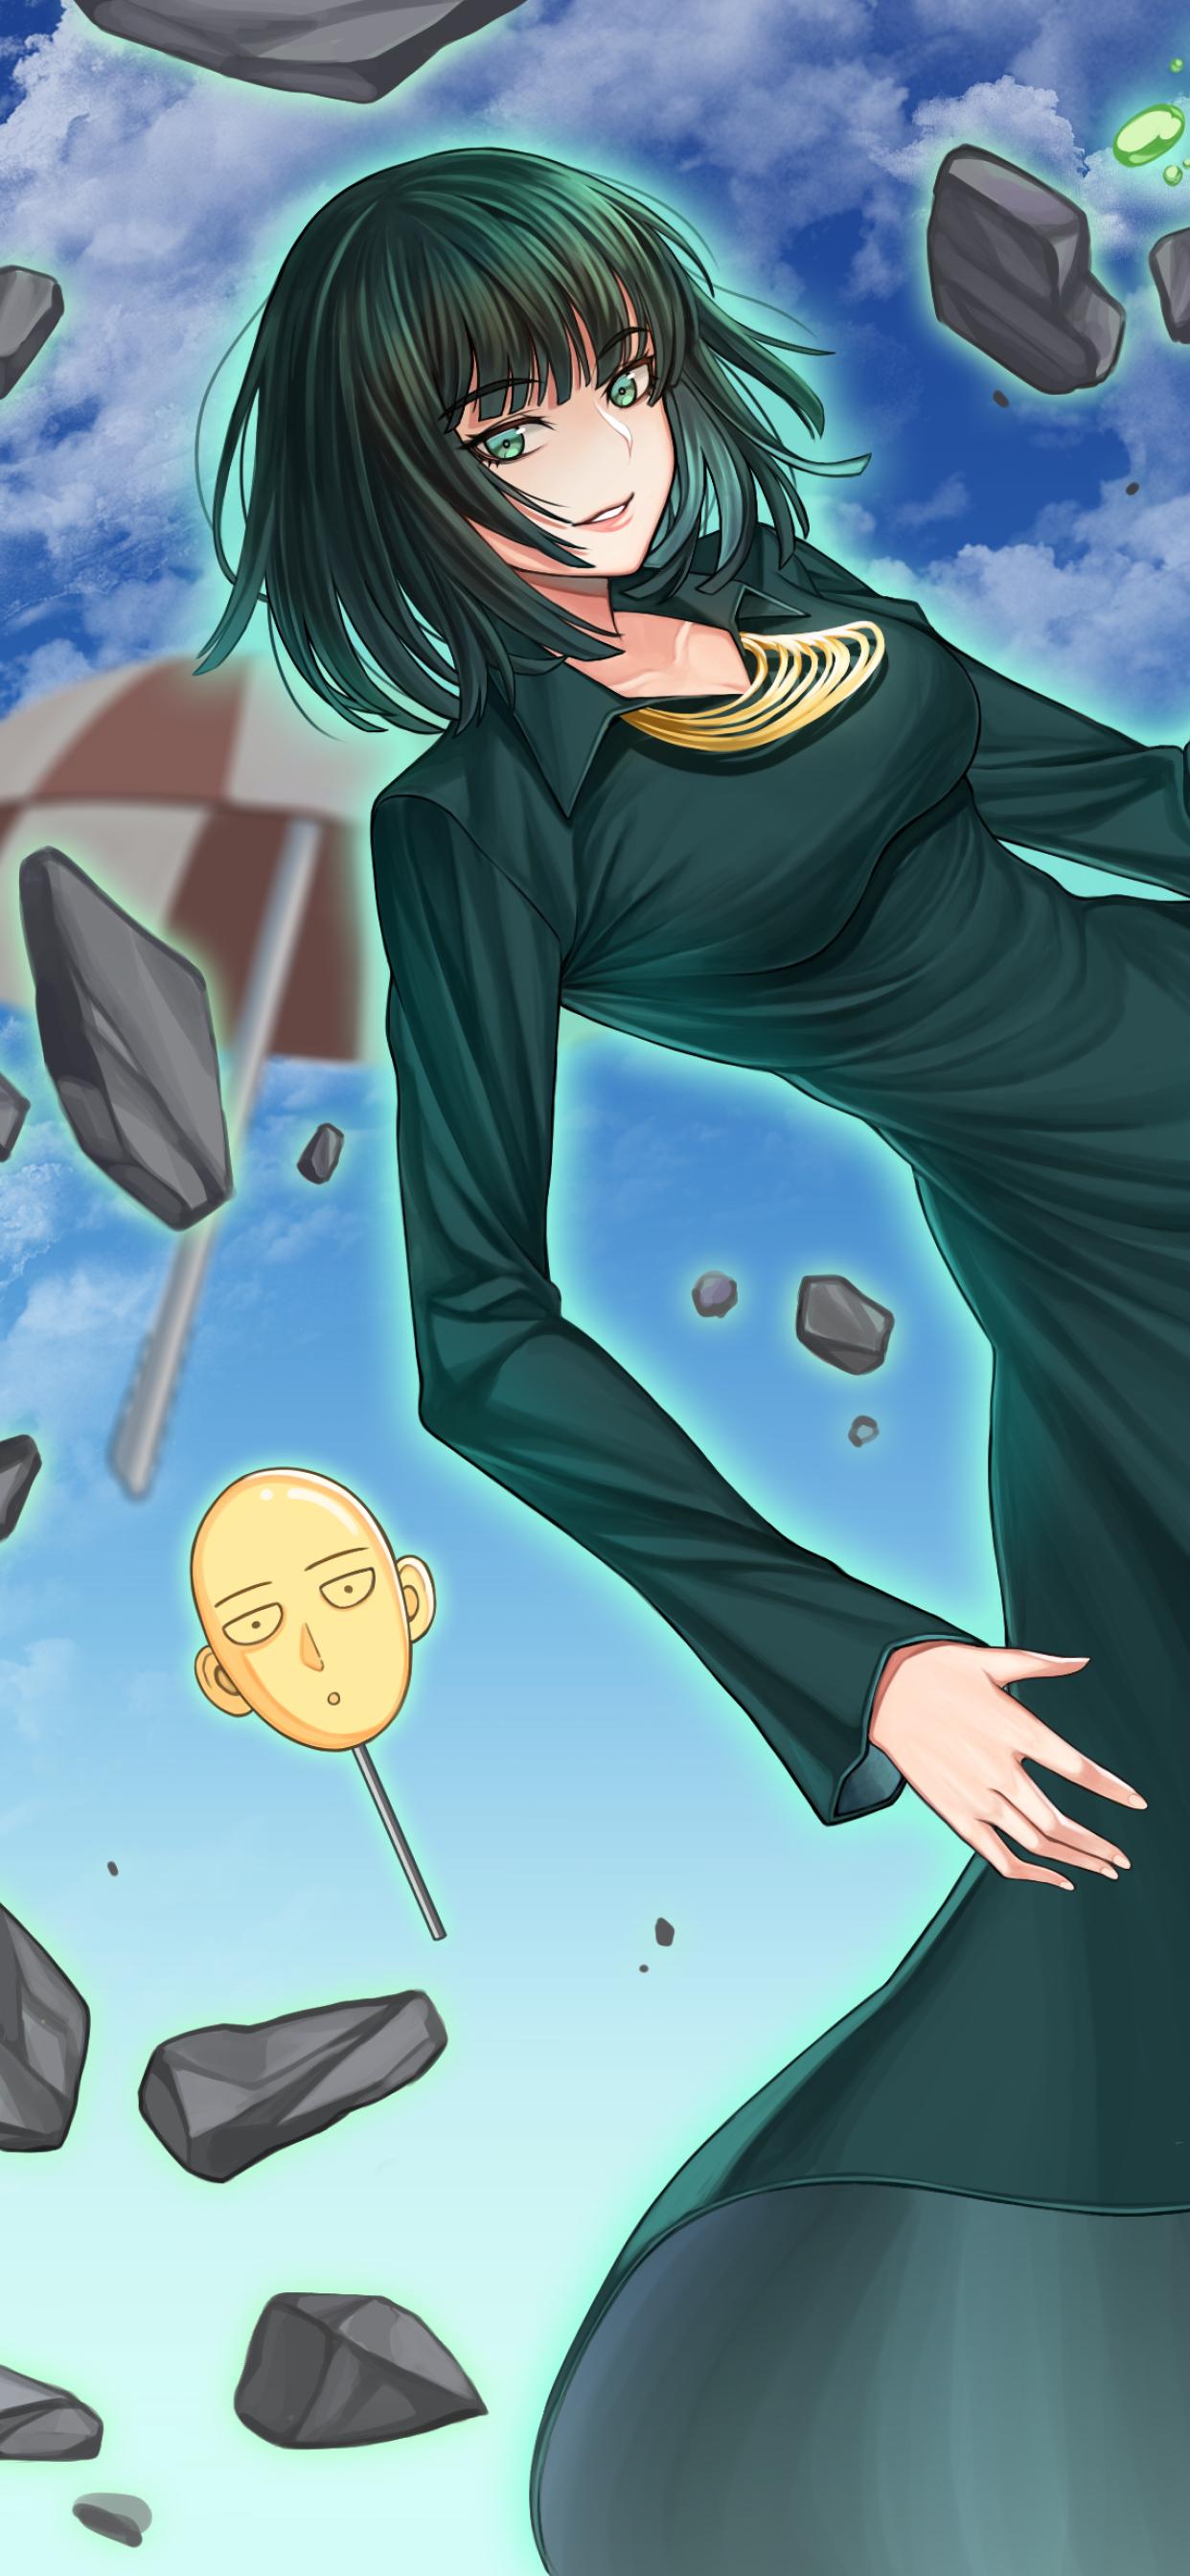 1242x2688 Fubuki One Punch Man Iphone Xs Max Wallpaper Hd Anime